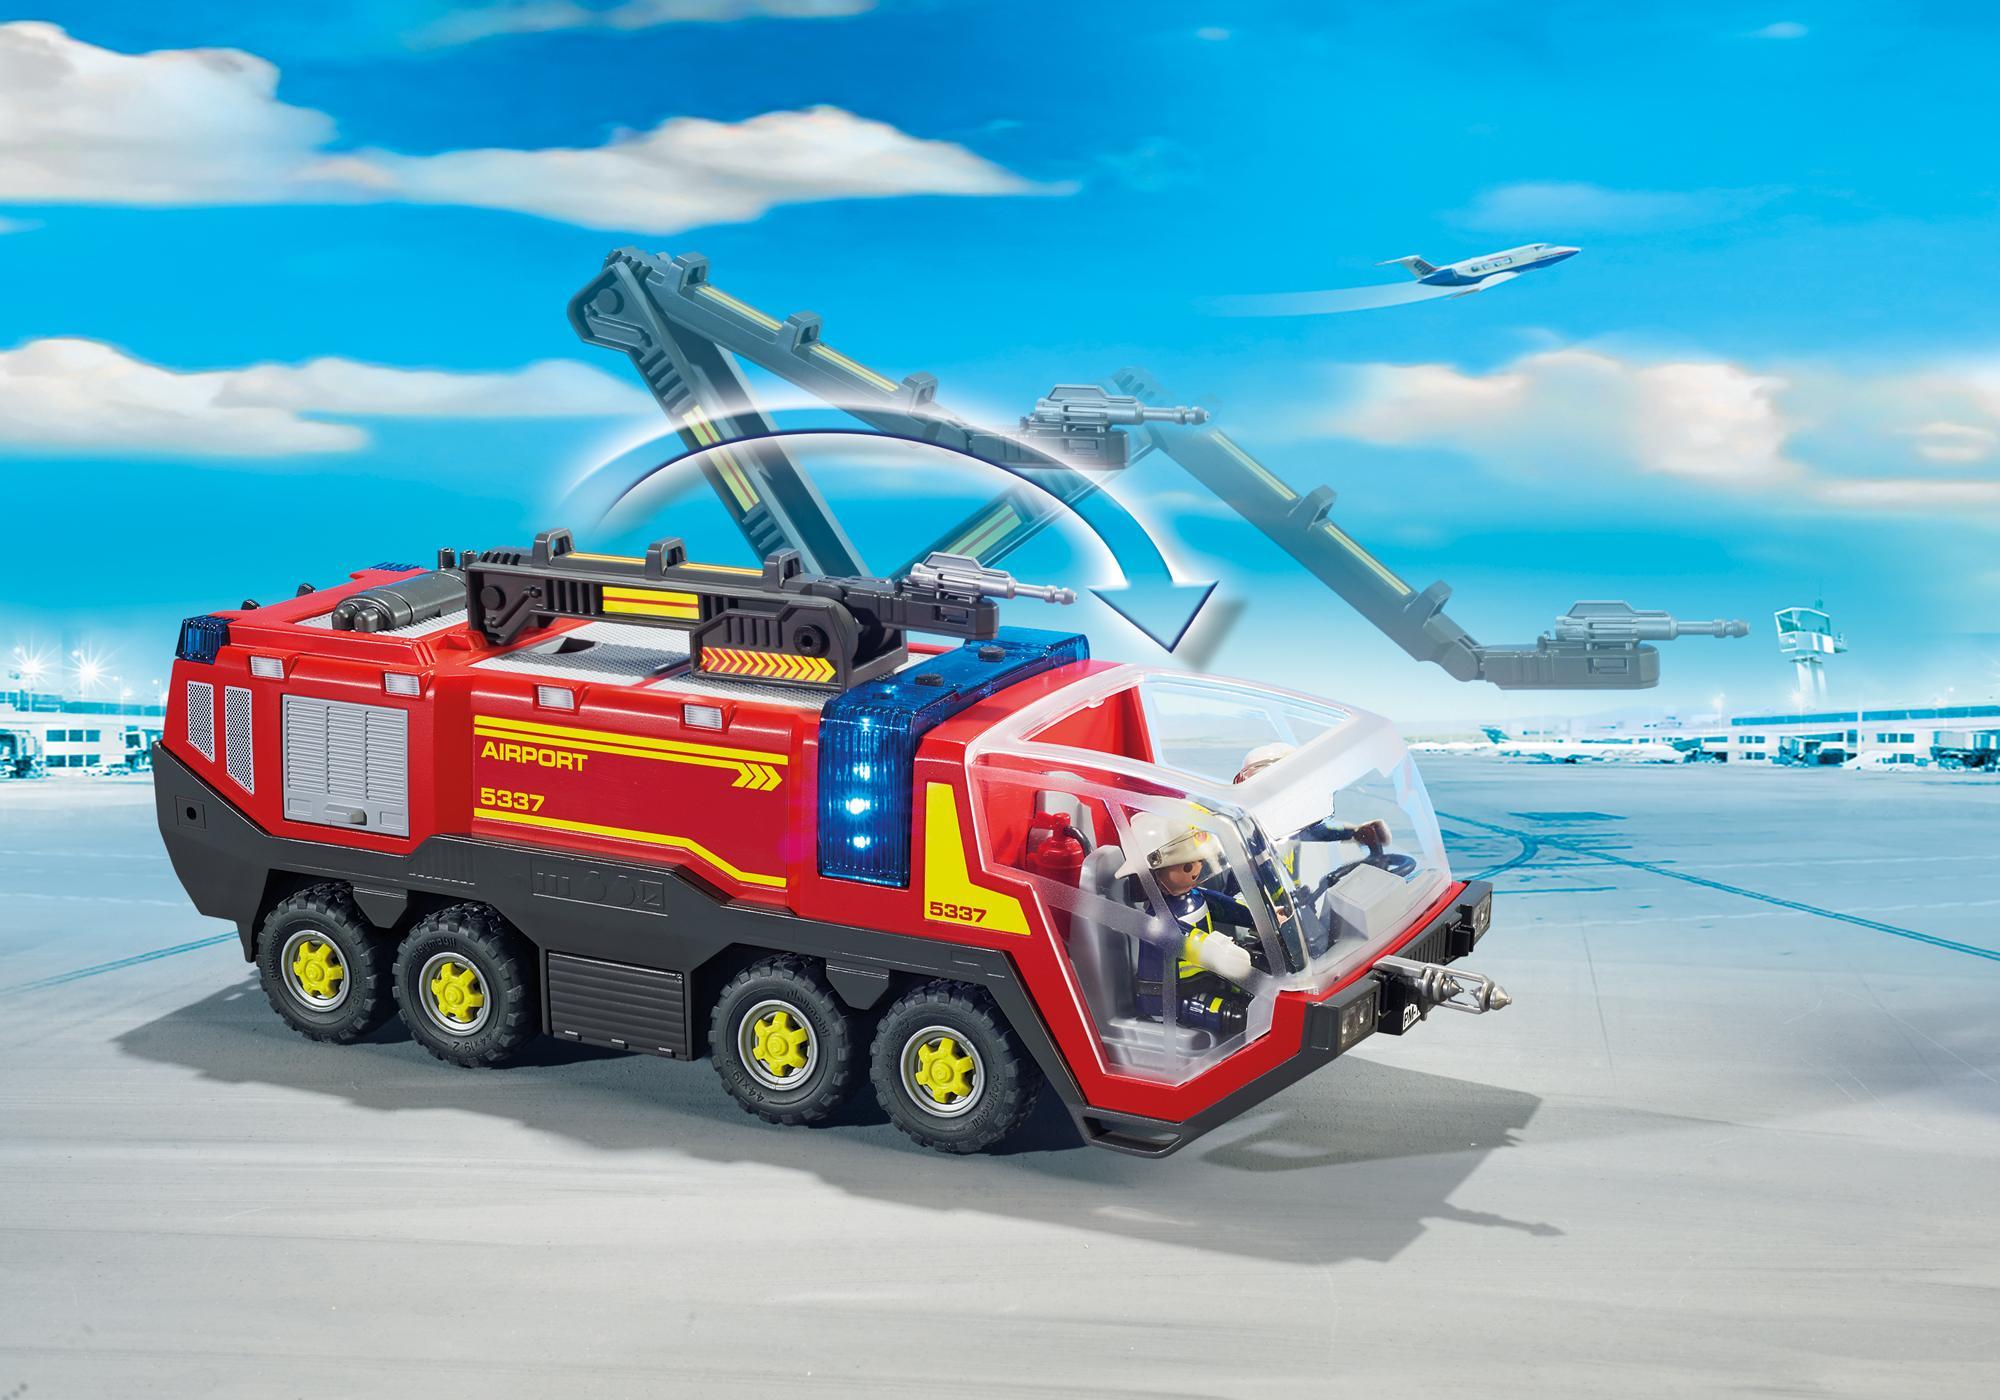 http://media.playmobil.com/i/playmobil/5337_product_extra4/Luchthavenbrandweer met licht en geluid